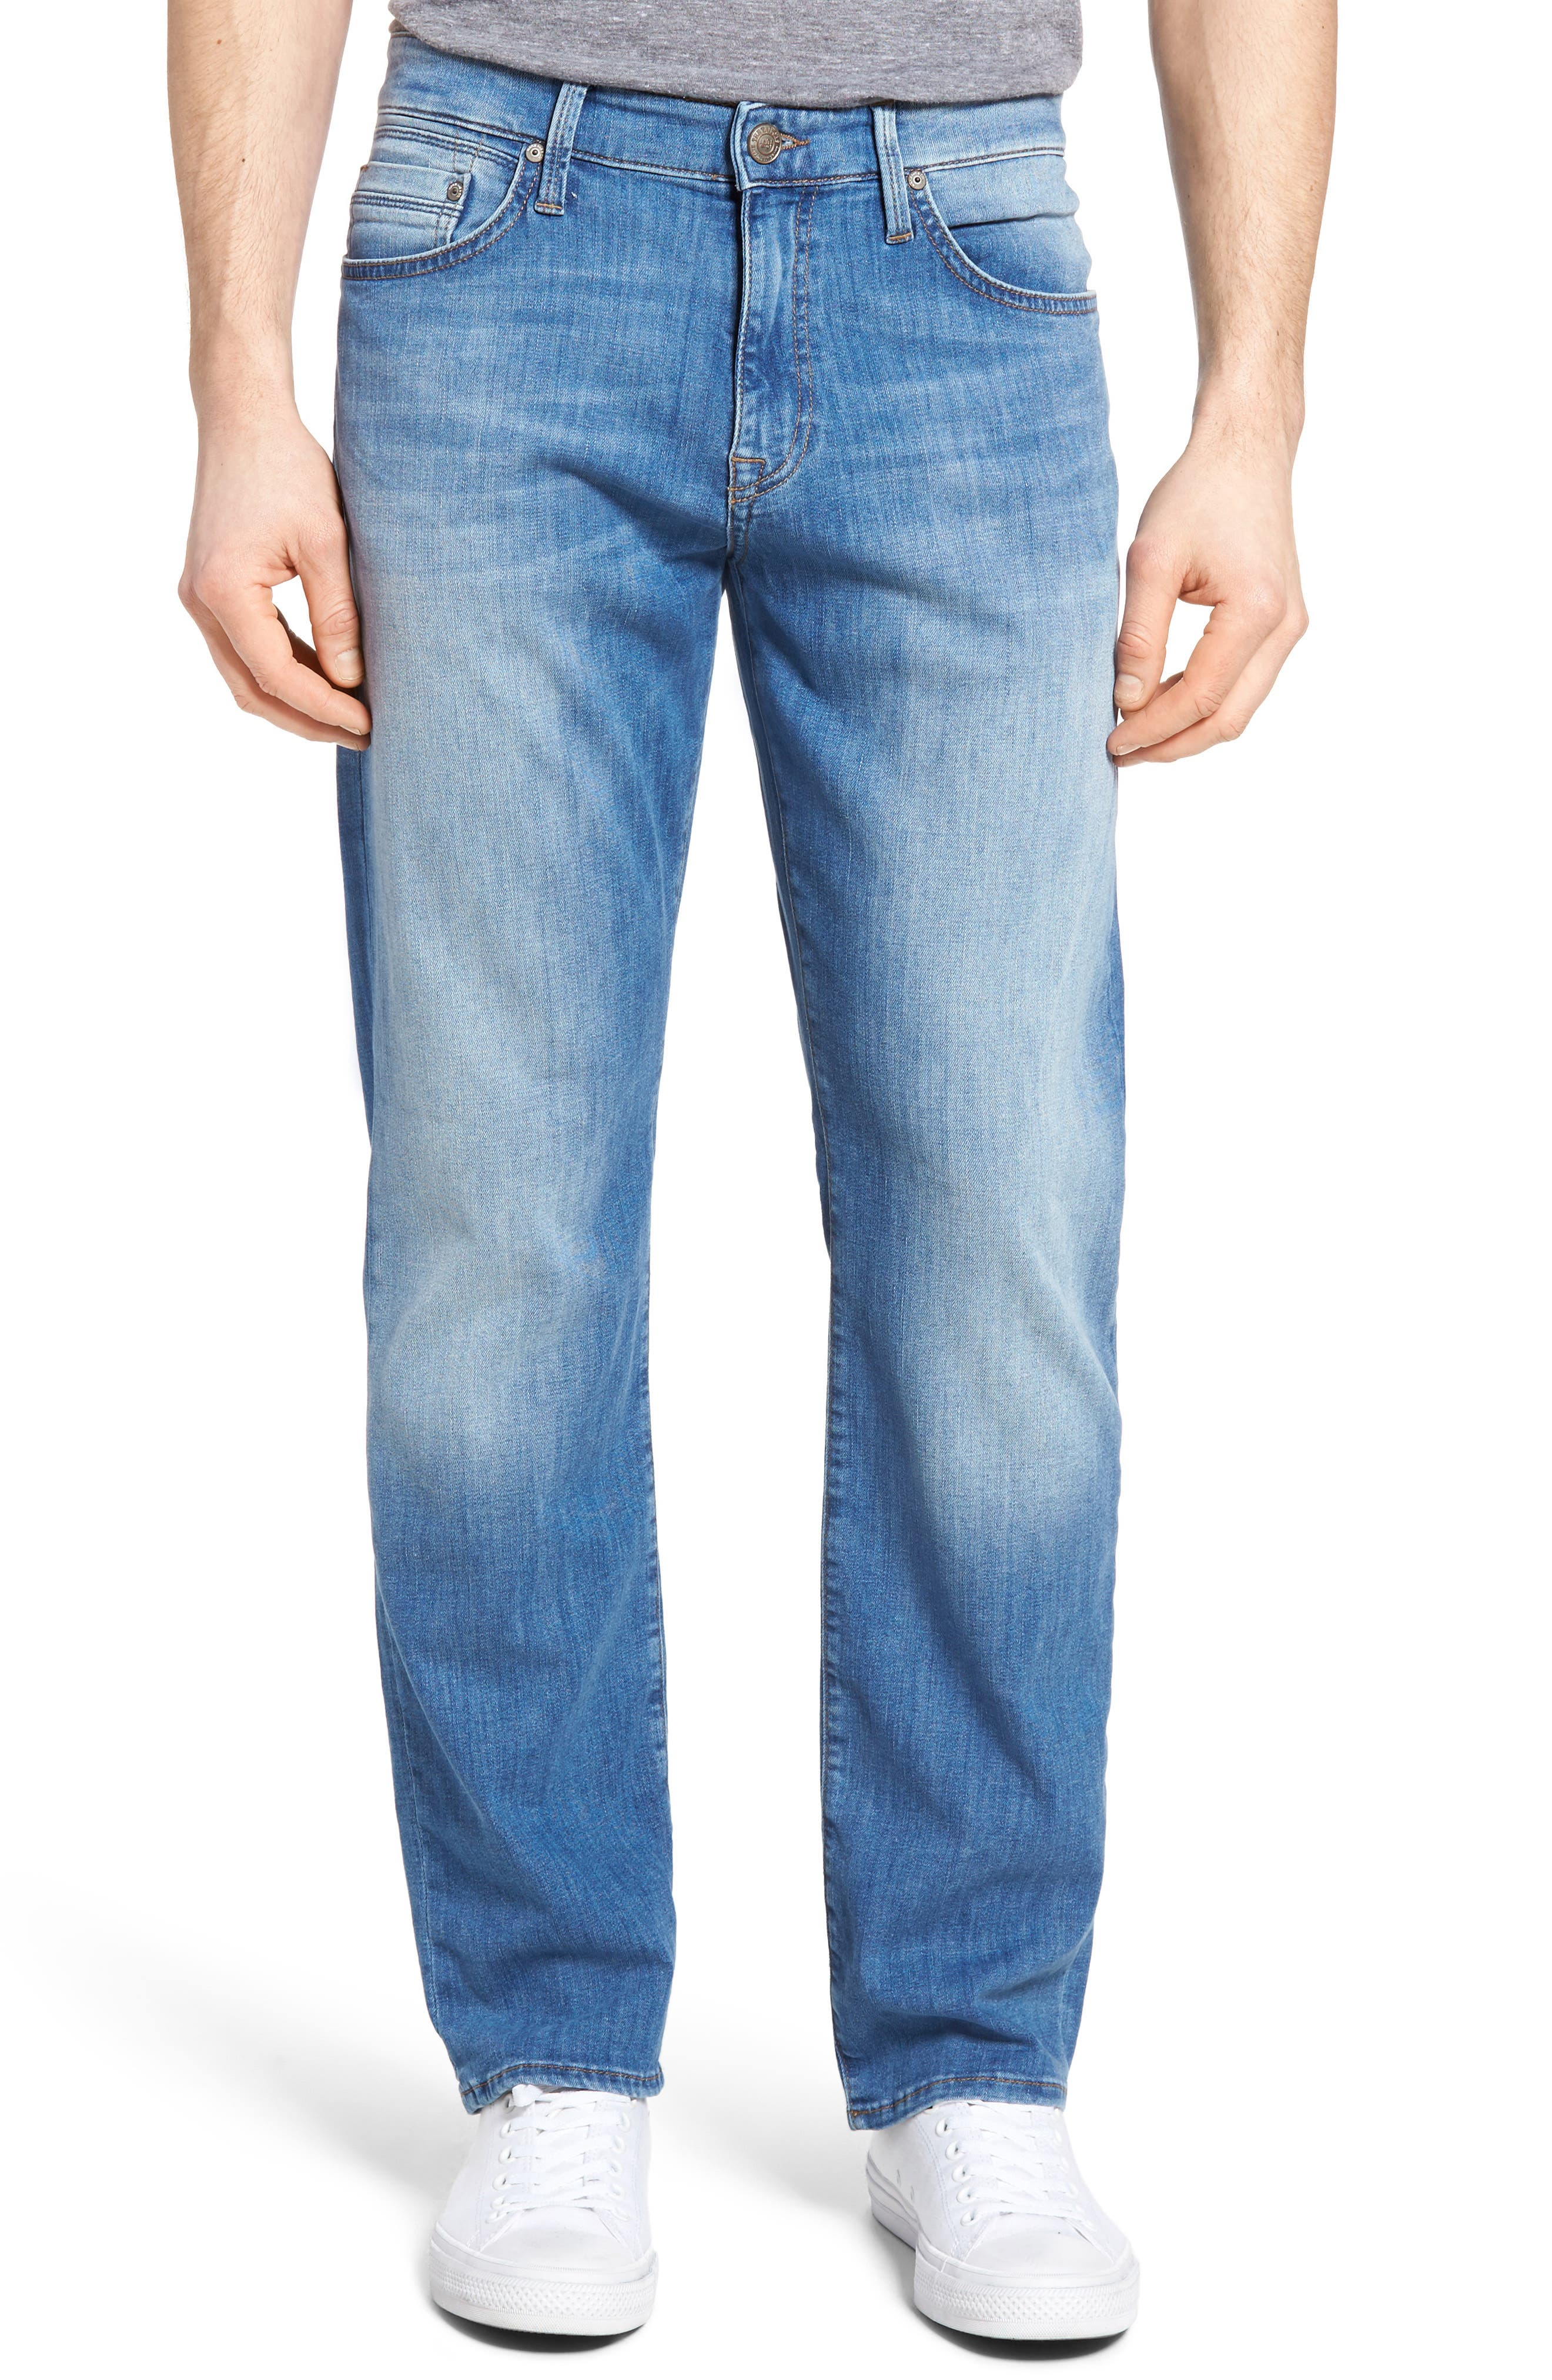 Myles Straight Leg Jeans,                         Main,                         color, Mid Blue Portland